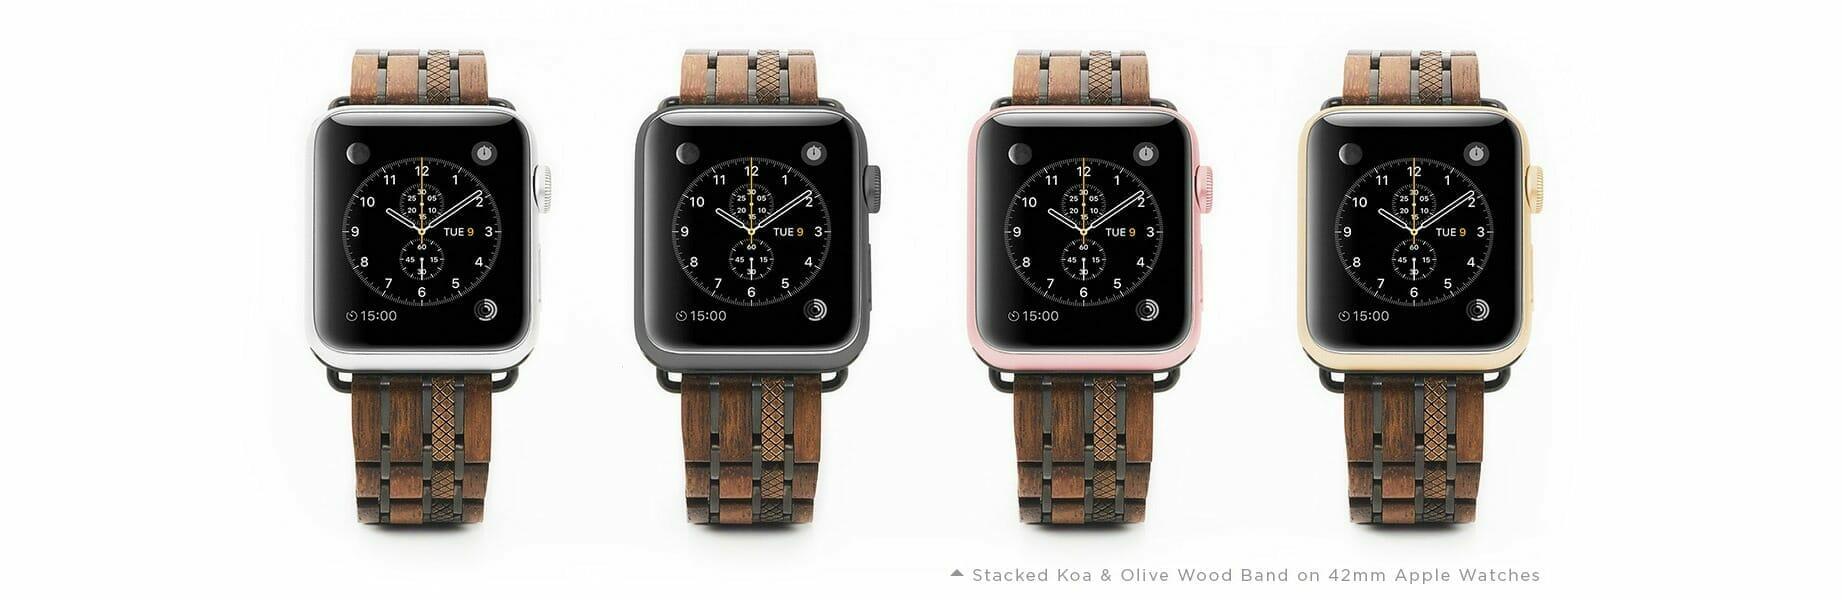 JORD Apple Watch Bands